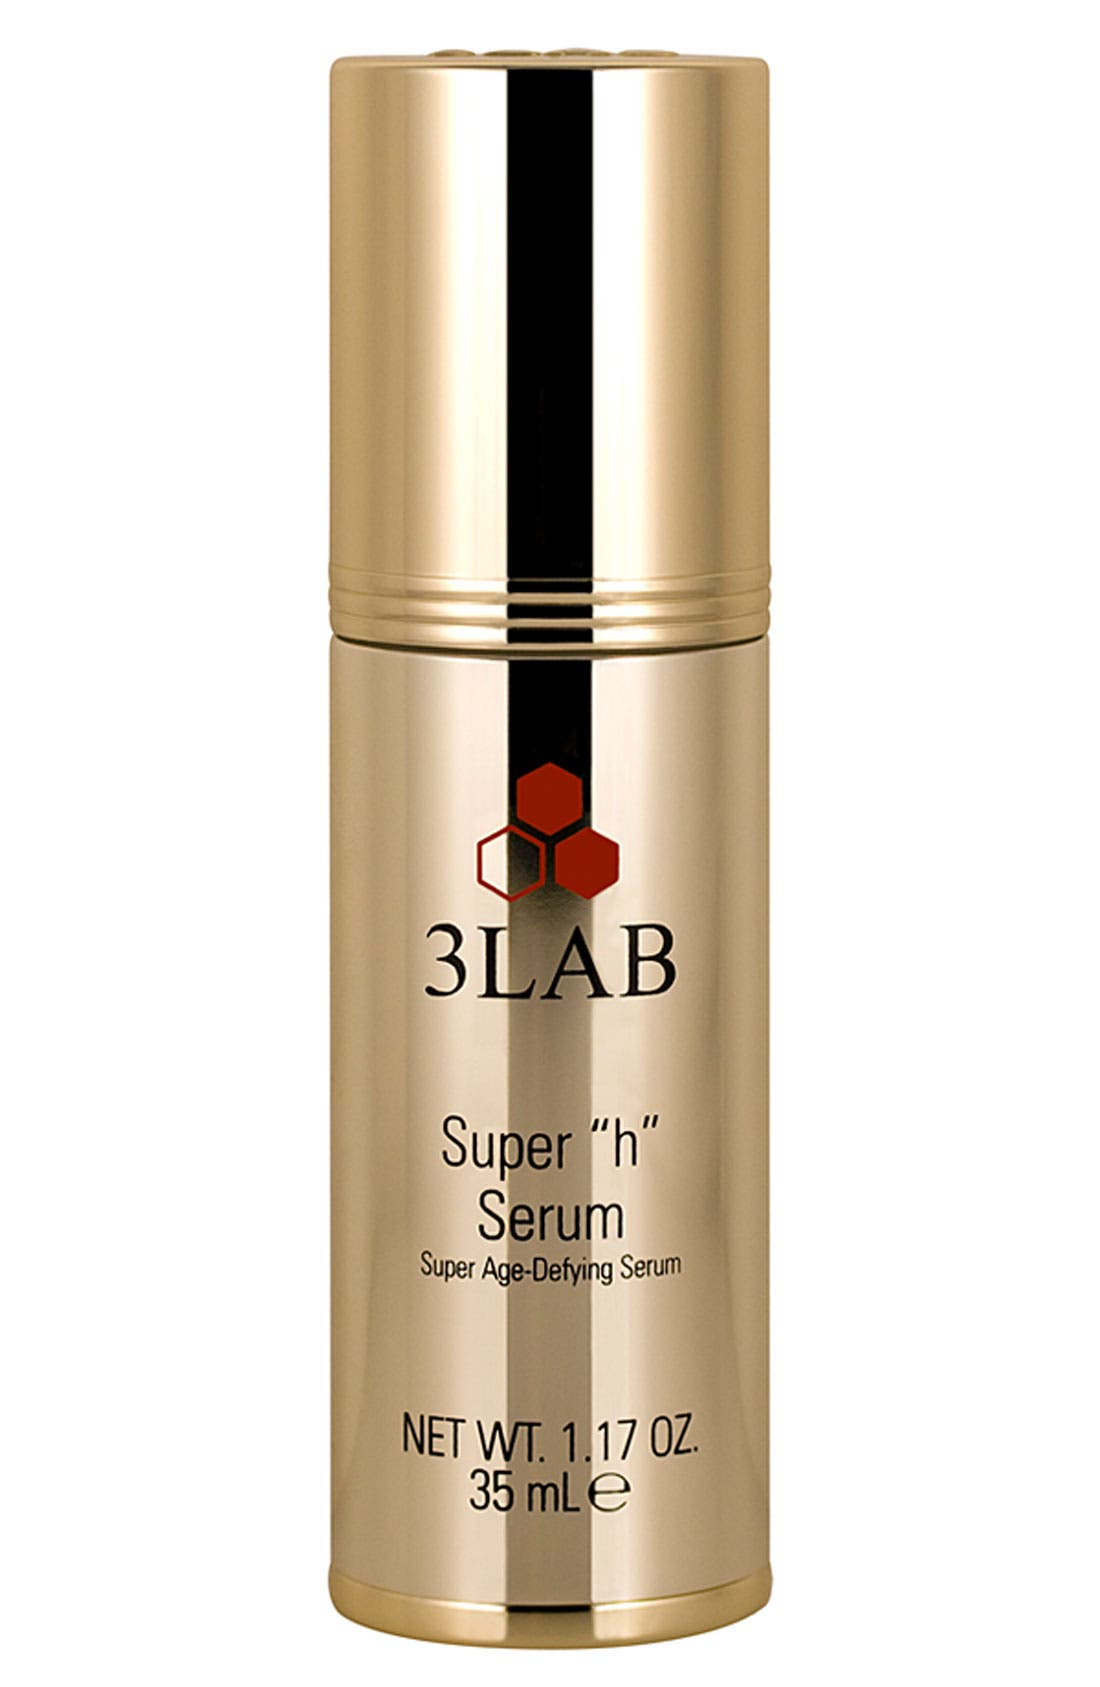 3LAB Super h Age-Defying Serum